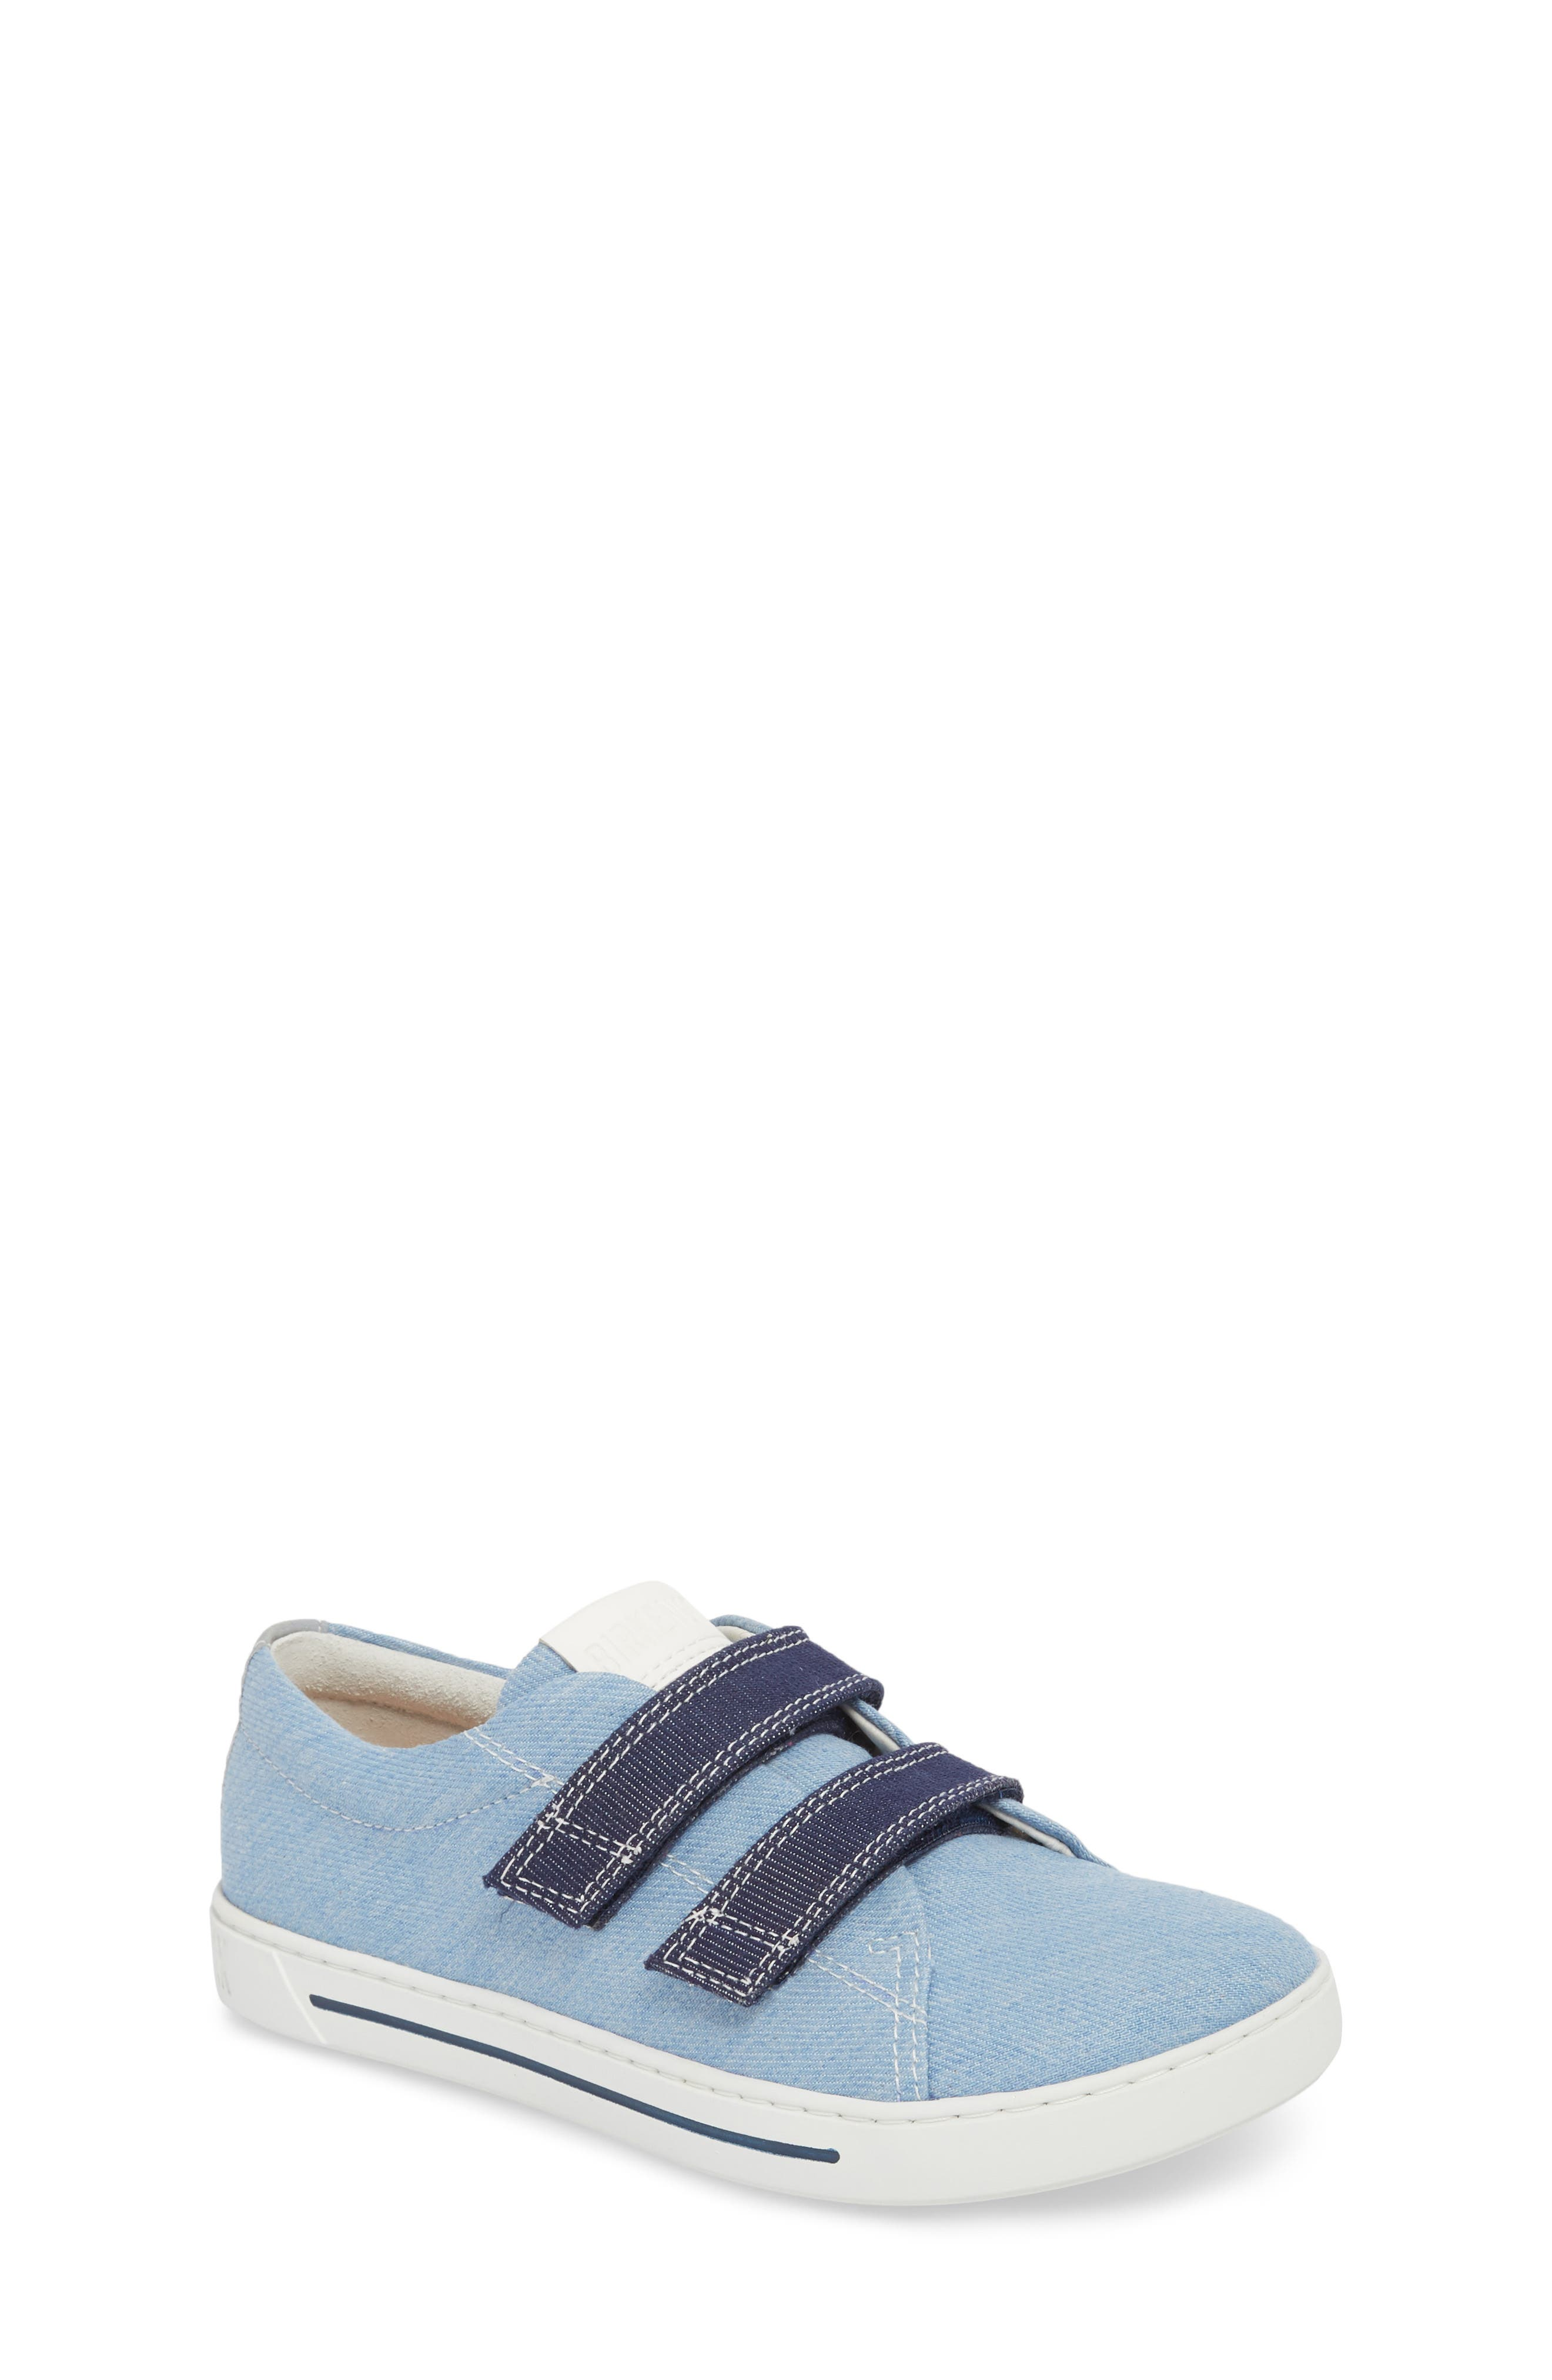 Alternate Image 1 Selected - Birkenstock Arran Sneaker (Toddler & Little Kid)